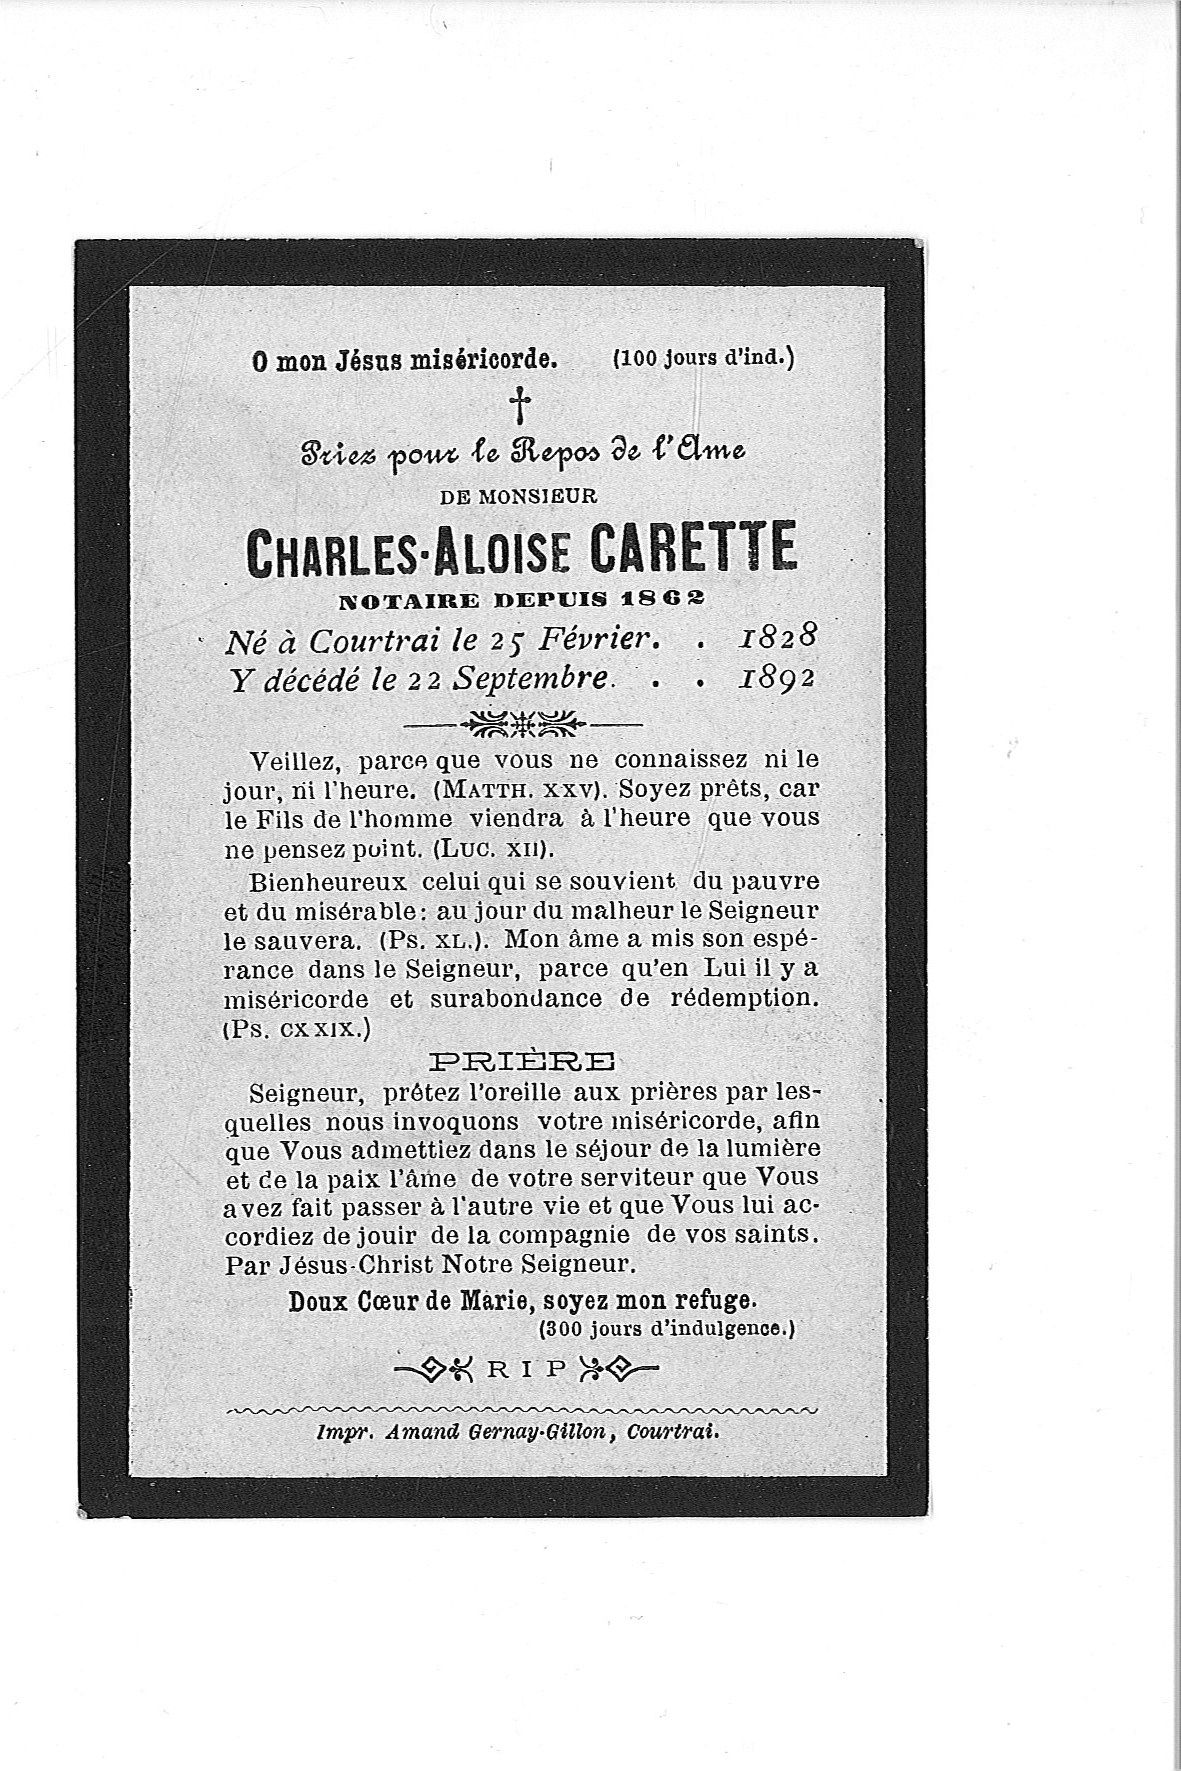 charles-aloise20090216142734_00021.jpg